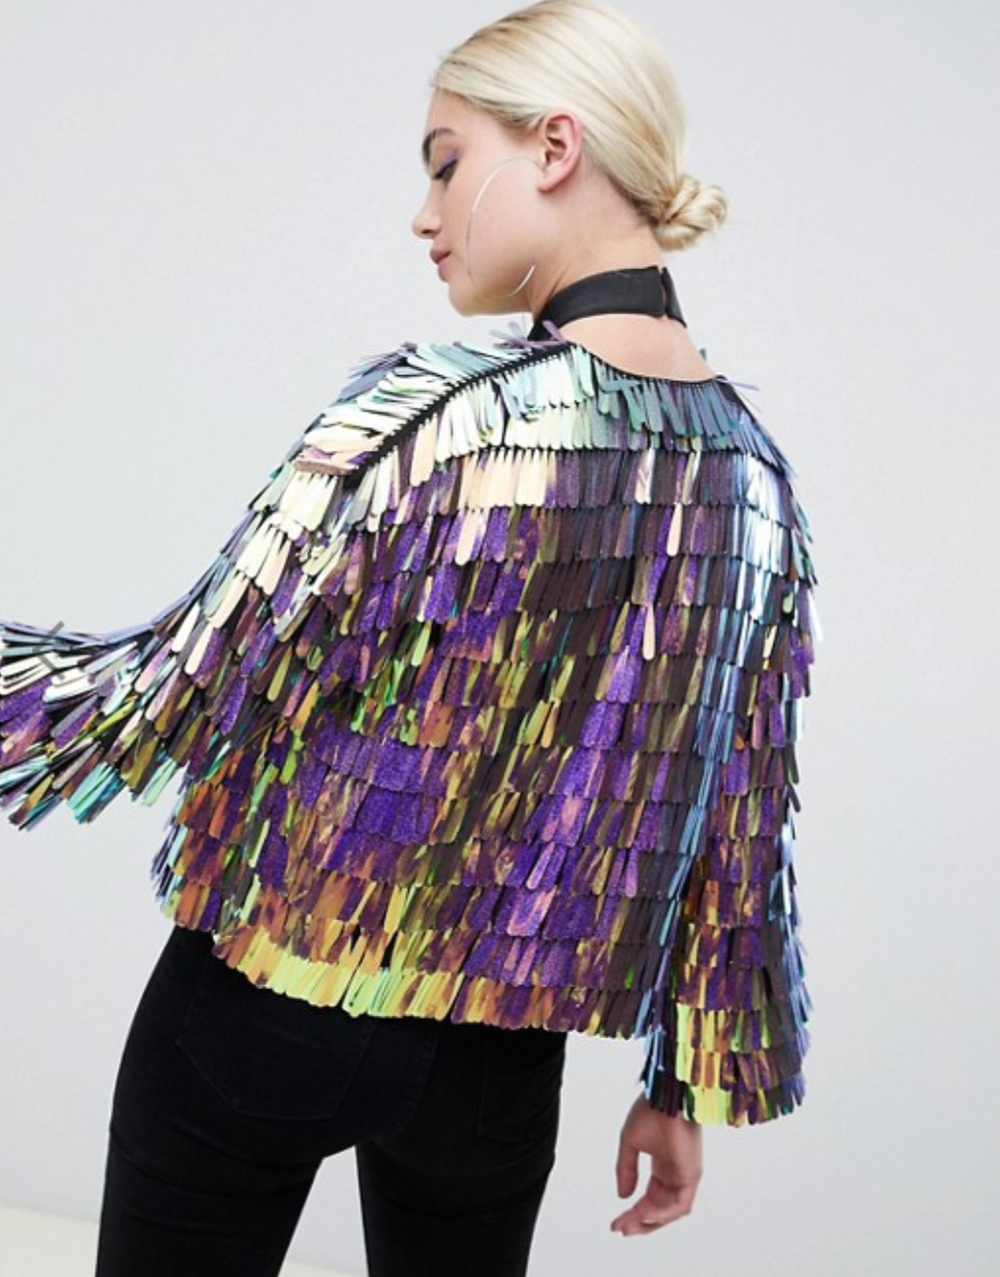 Iridescent Fringe Sequin Jacket By ASOS